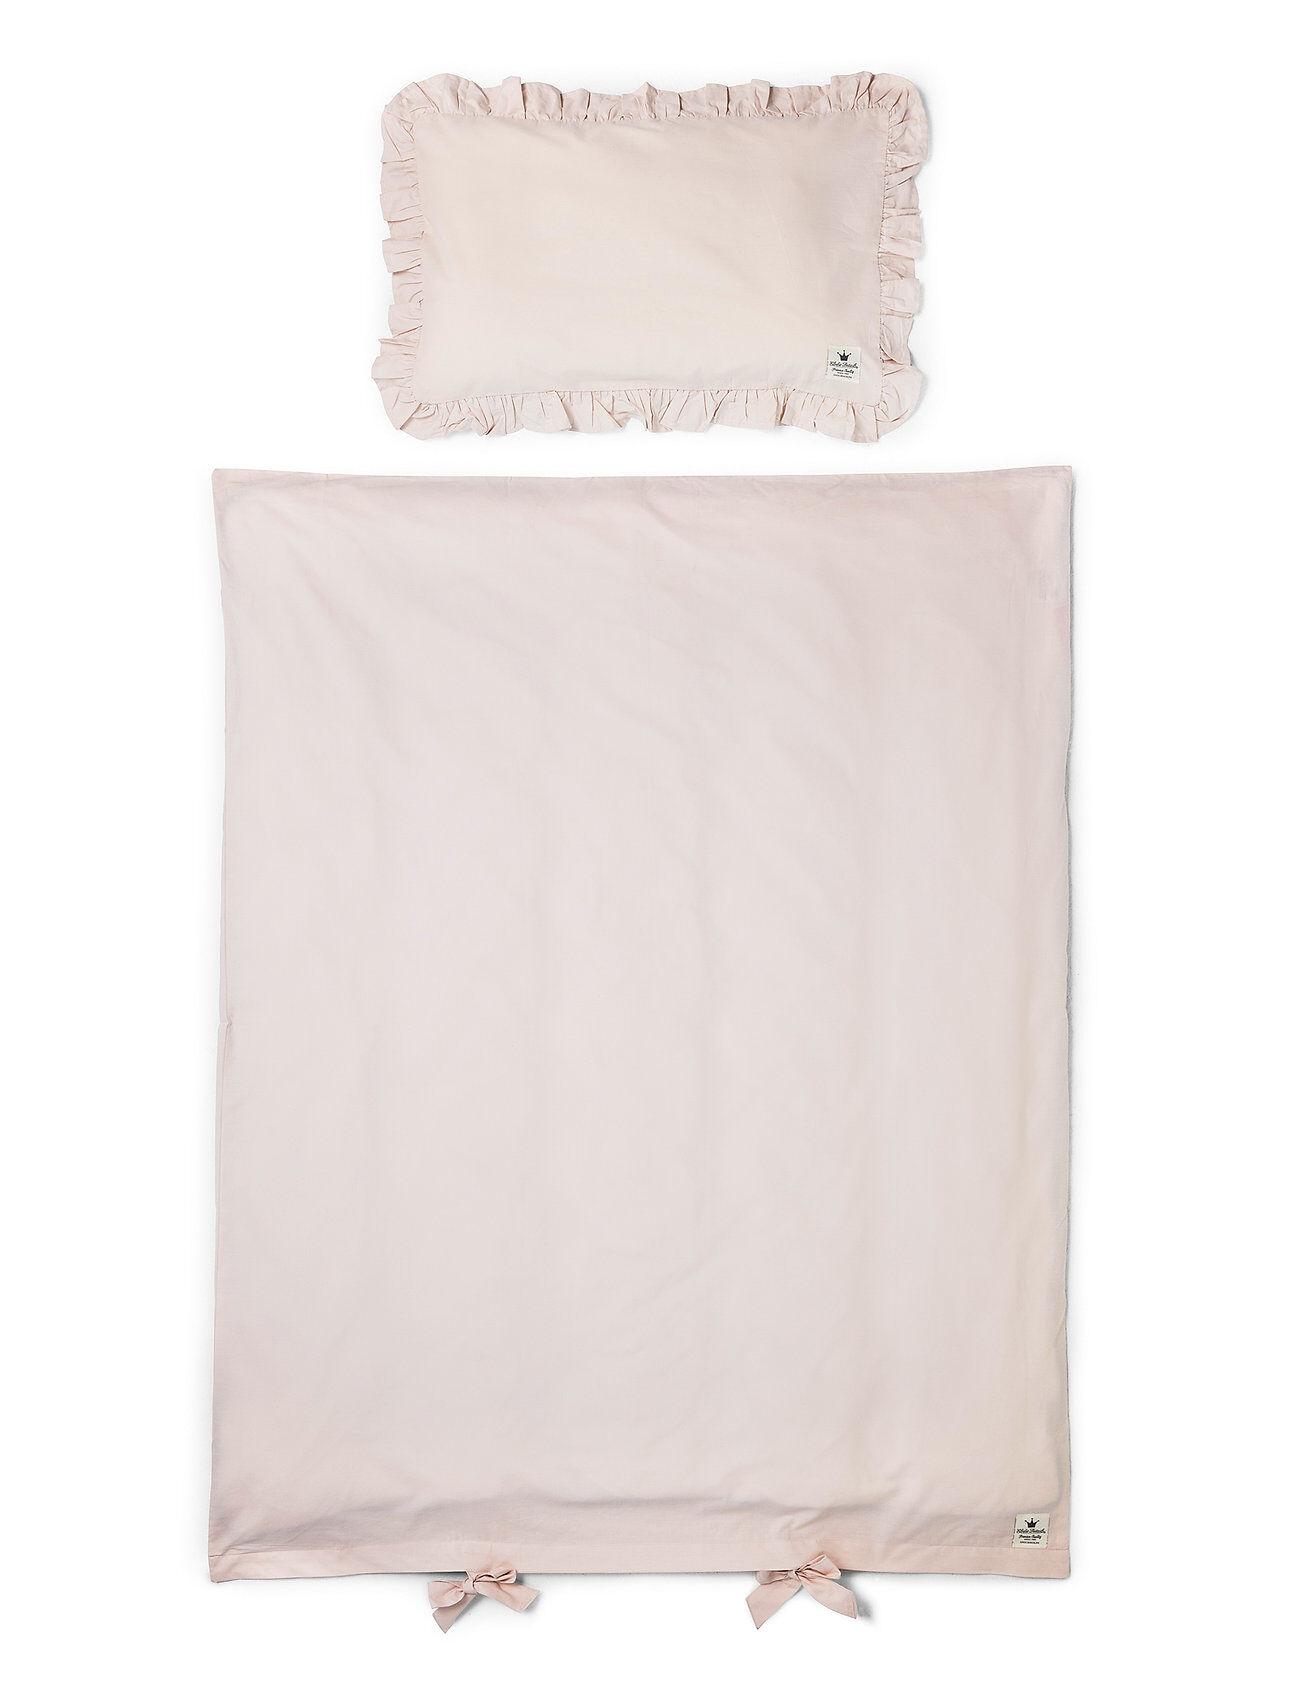 Elodie Details Crib Bedding Set - Powder Pink Home Sleep Time Bedding & Sheets Vaaleanpunainen Elodie Details